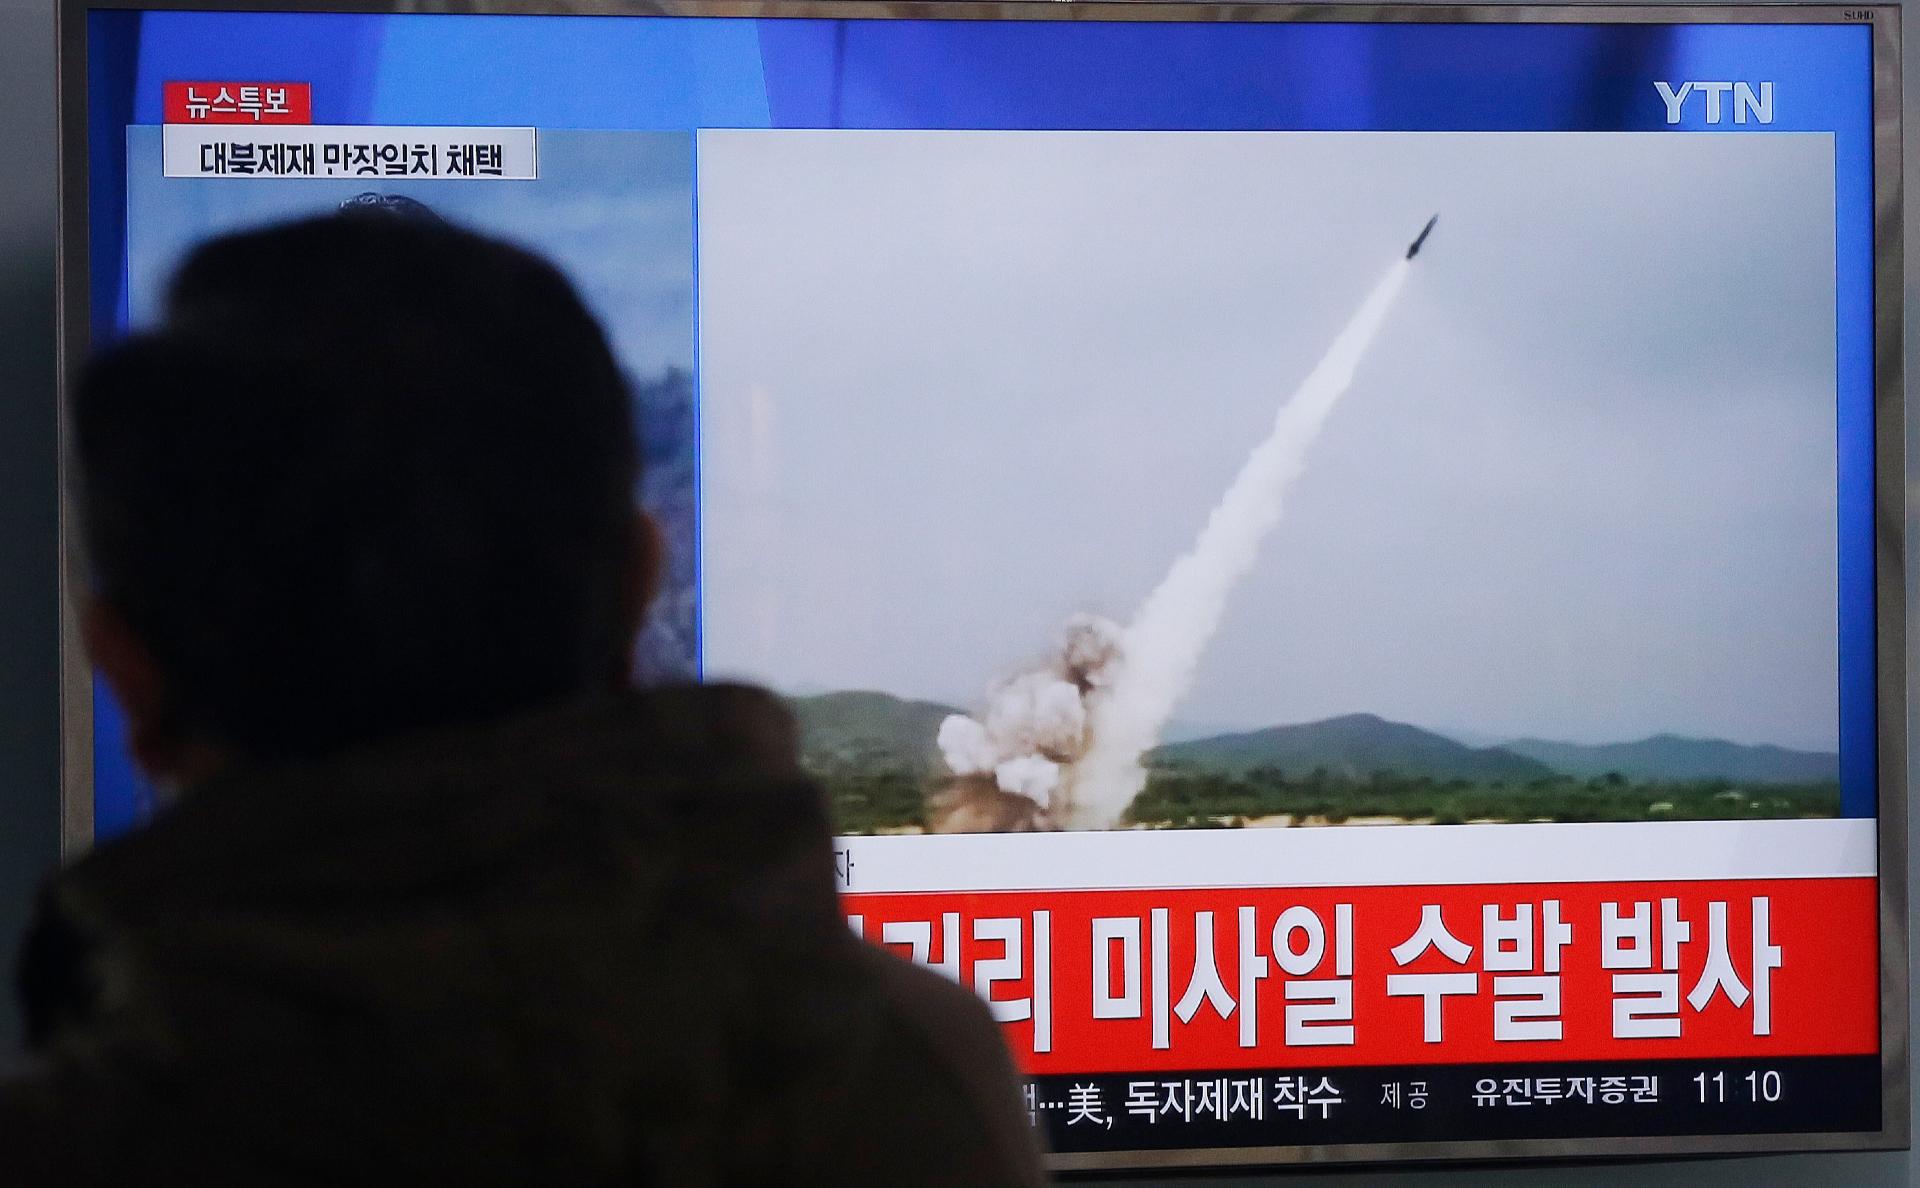 Запуск ракеты в КНДР. Март 2016 года